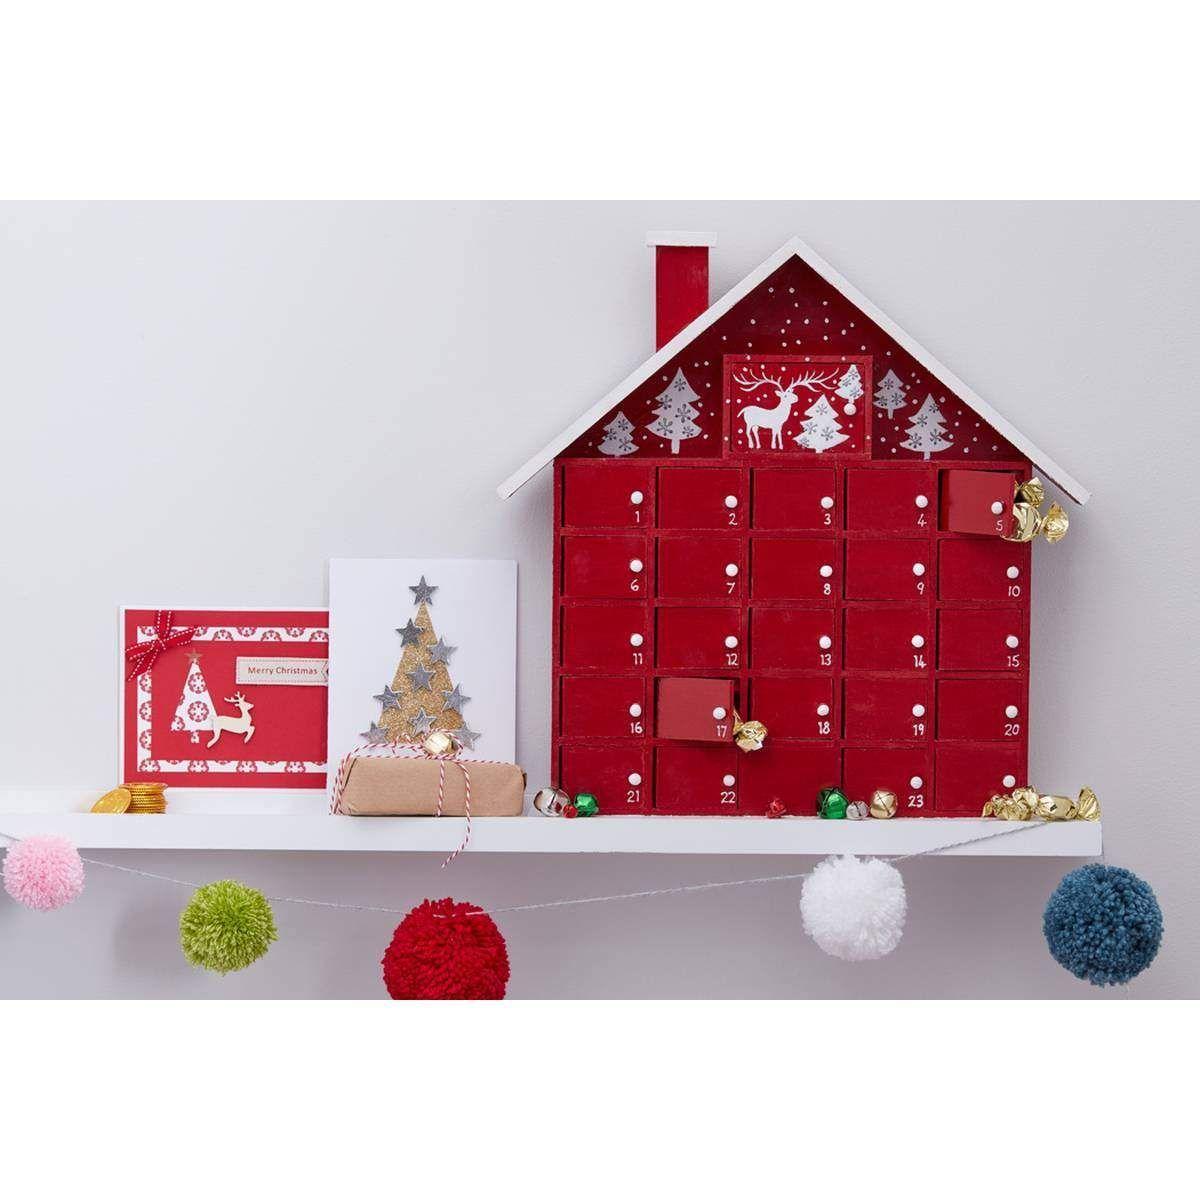 Wooden house advent calendar 40 cm hobbycraft christmas wooden house advent calendar 40 cm hobbycraft solutioingenieria Images